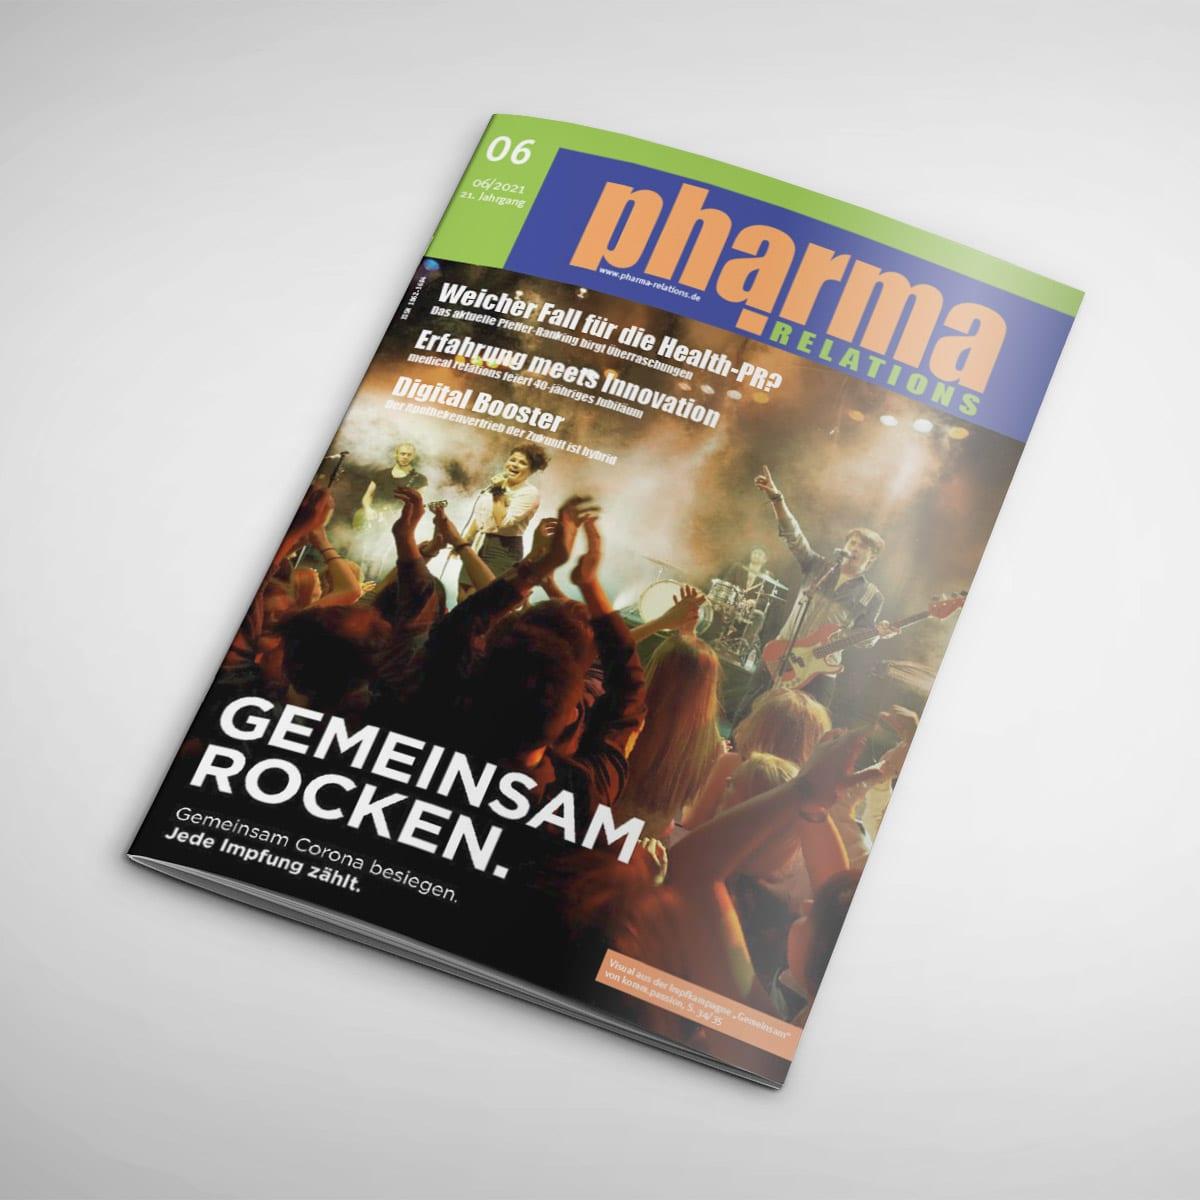 Pharma relations Cover